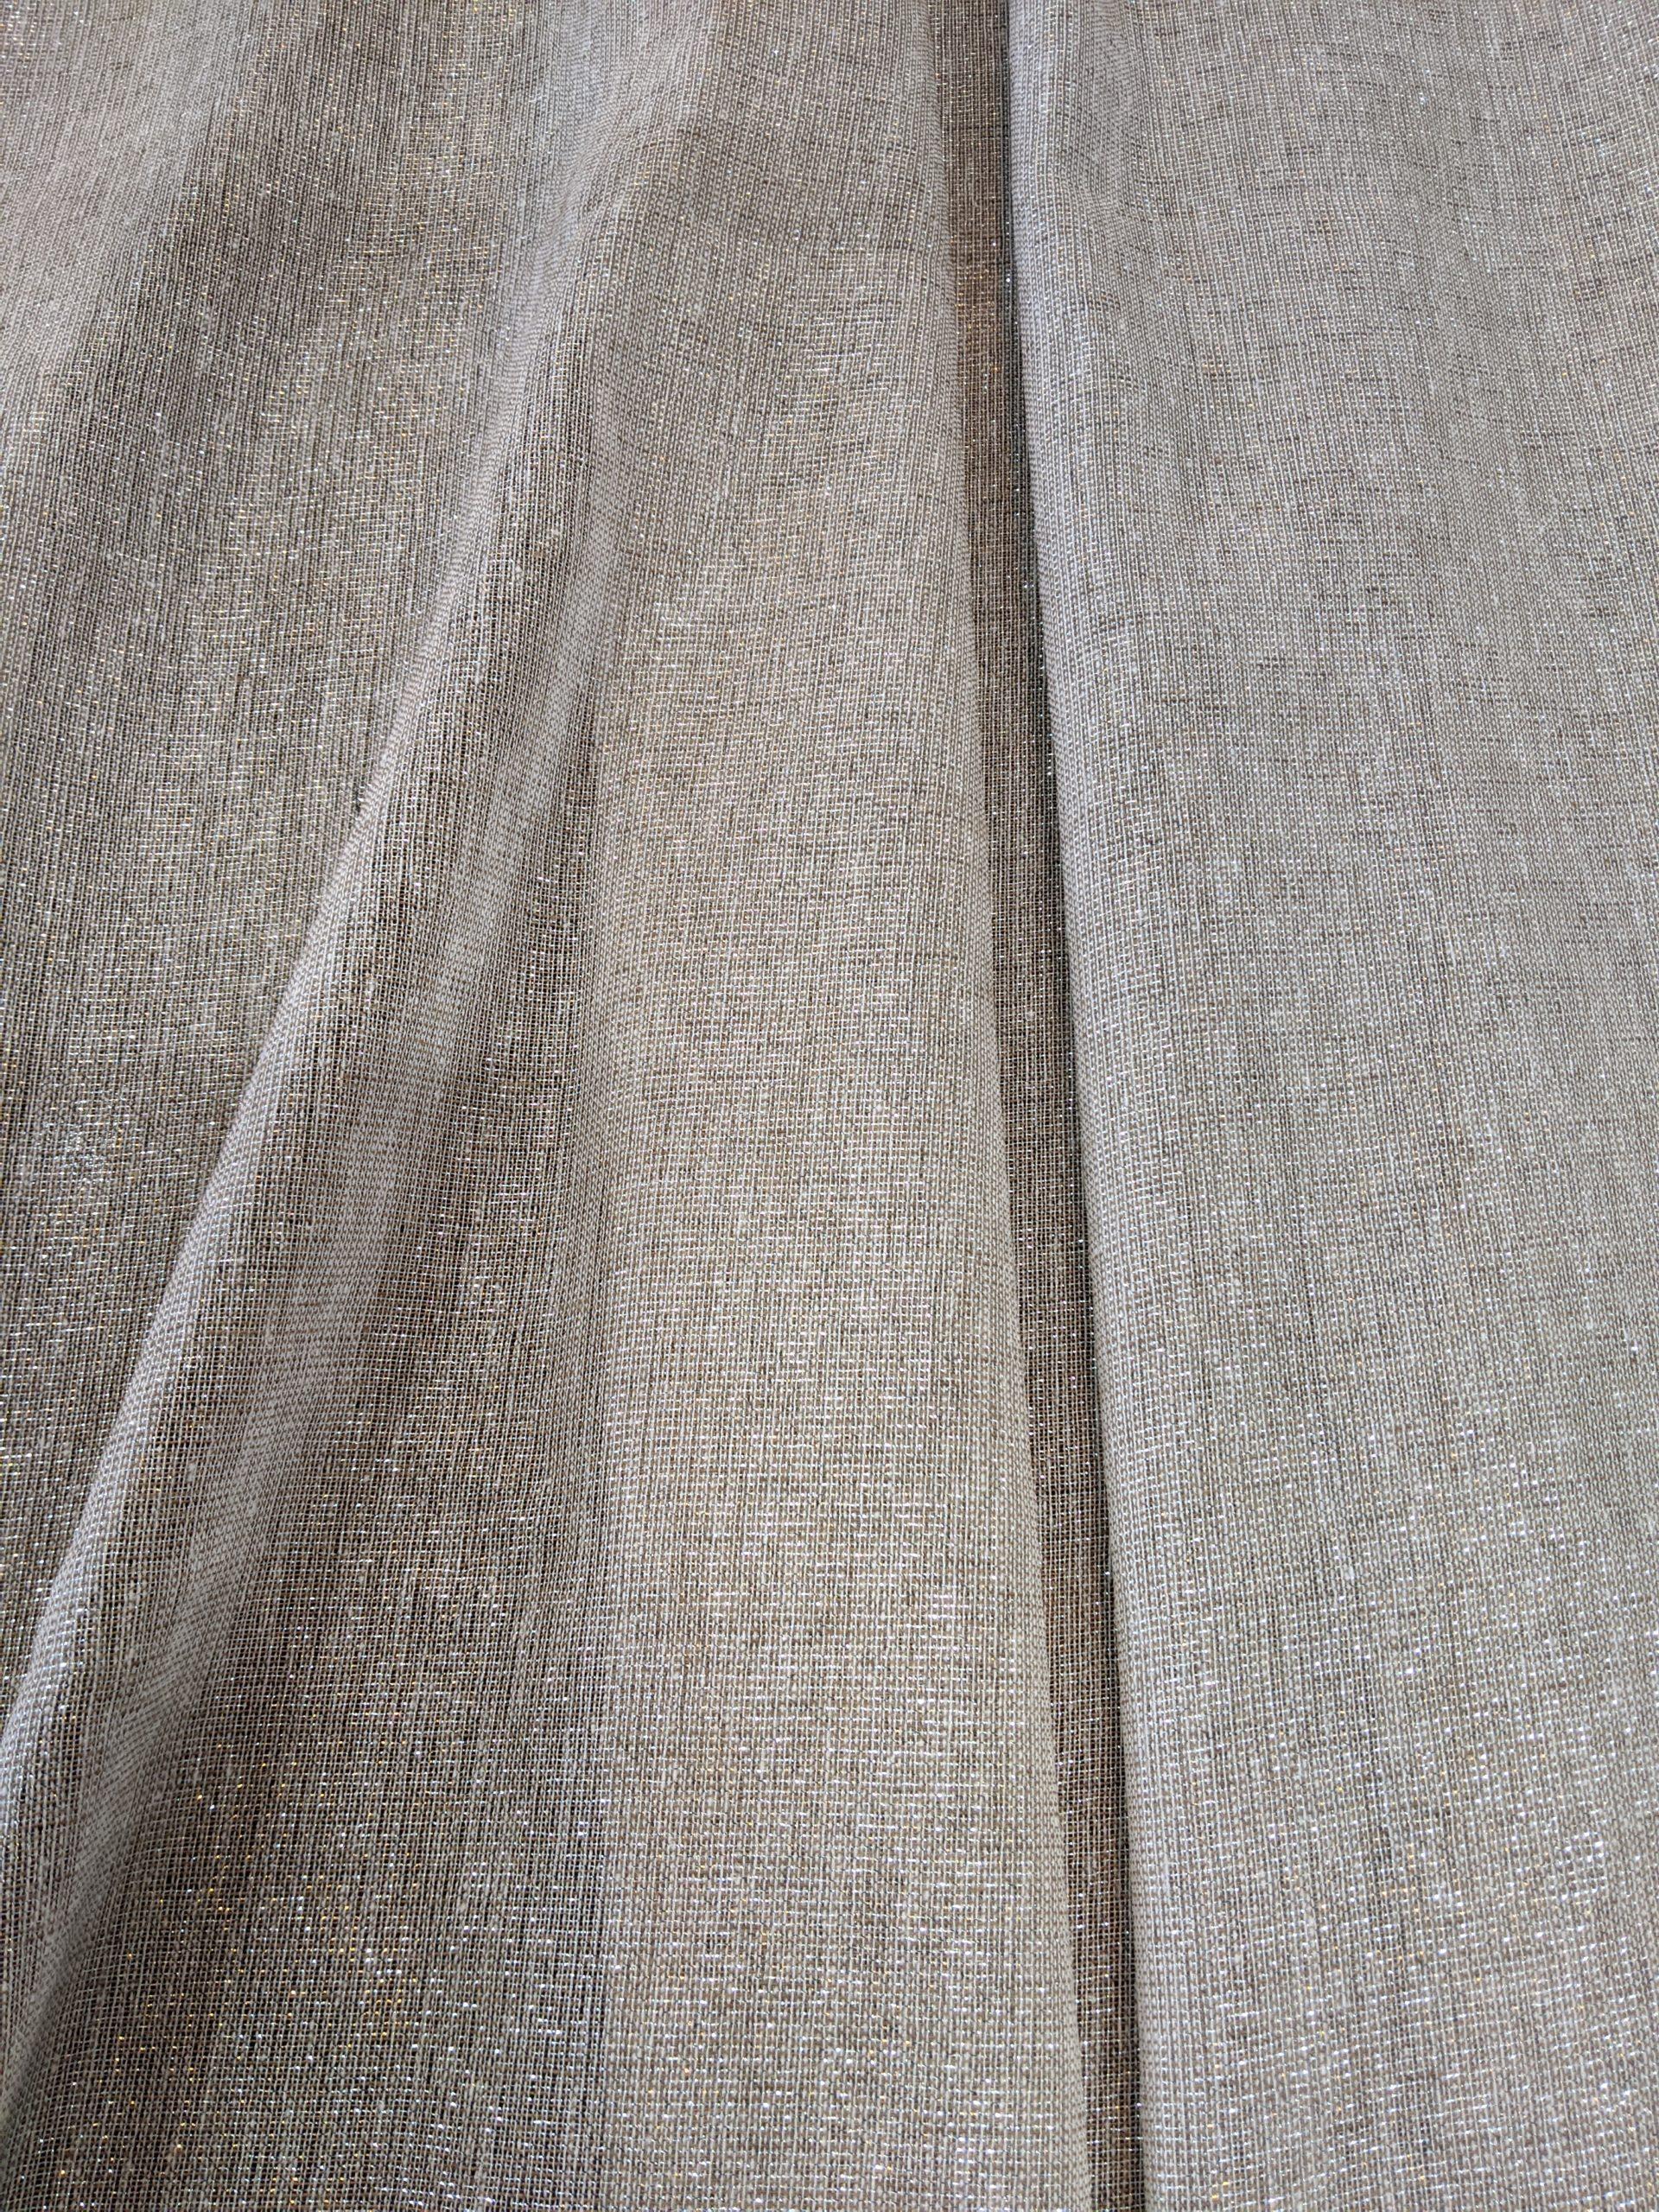 Metallic Gauze Flowy Runner/Drape